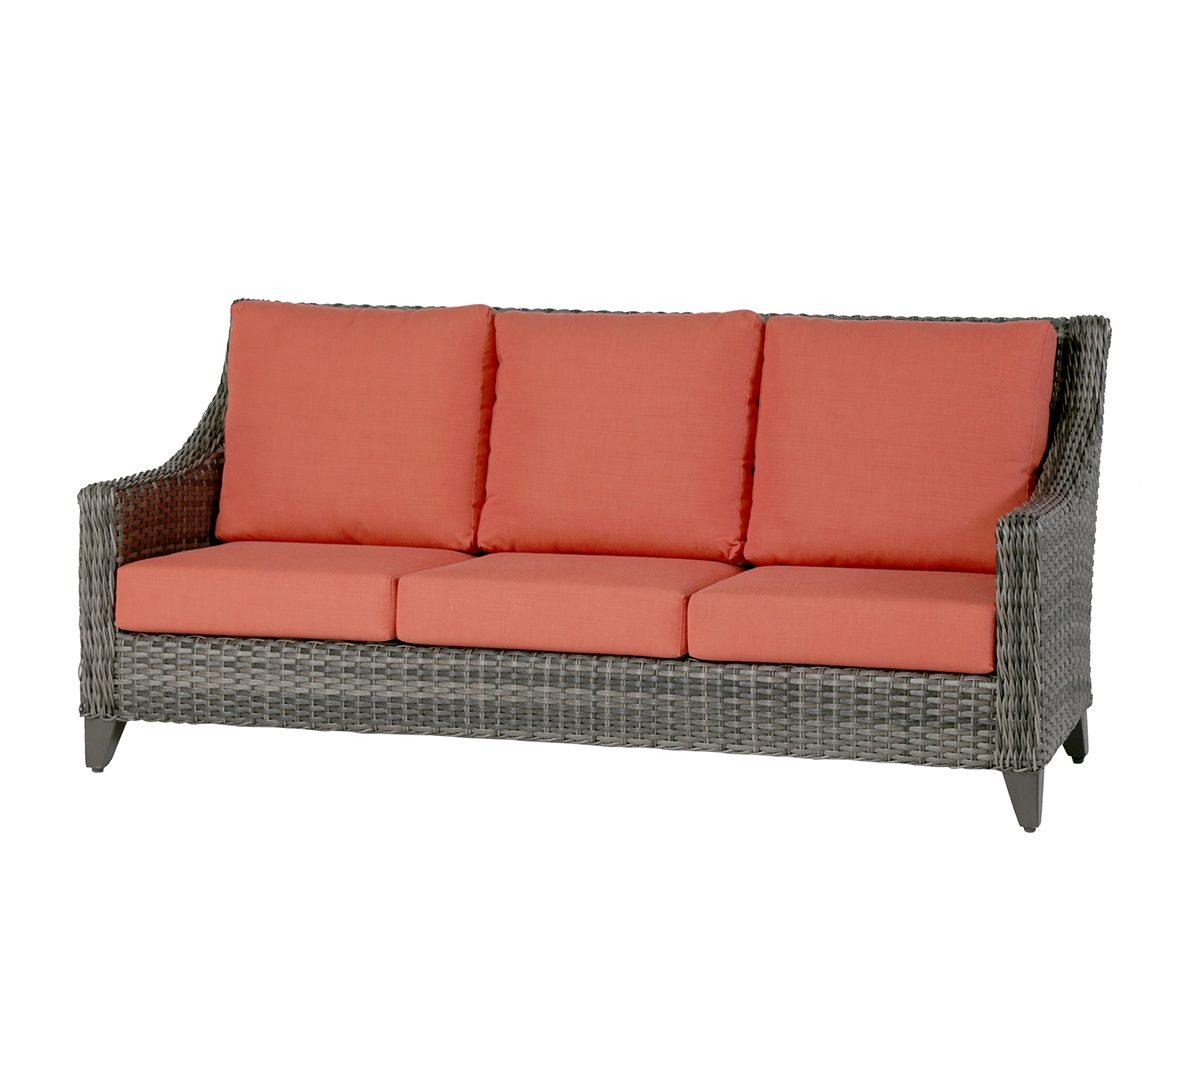 ratana st martin sofa | Shop Patio bay